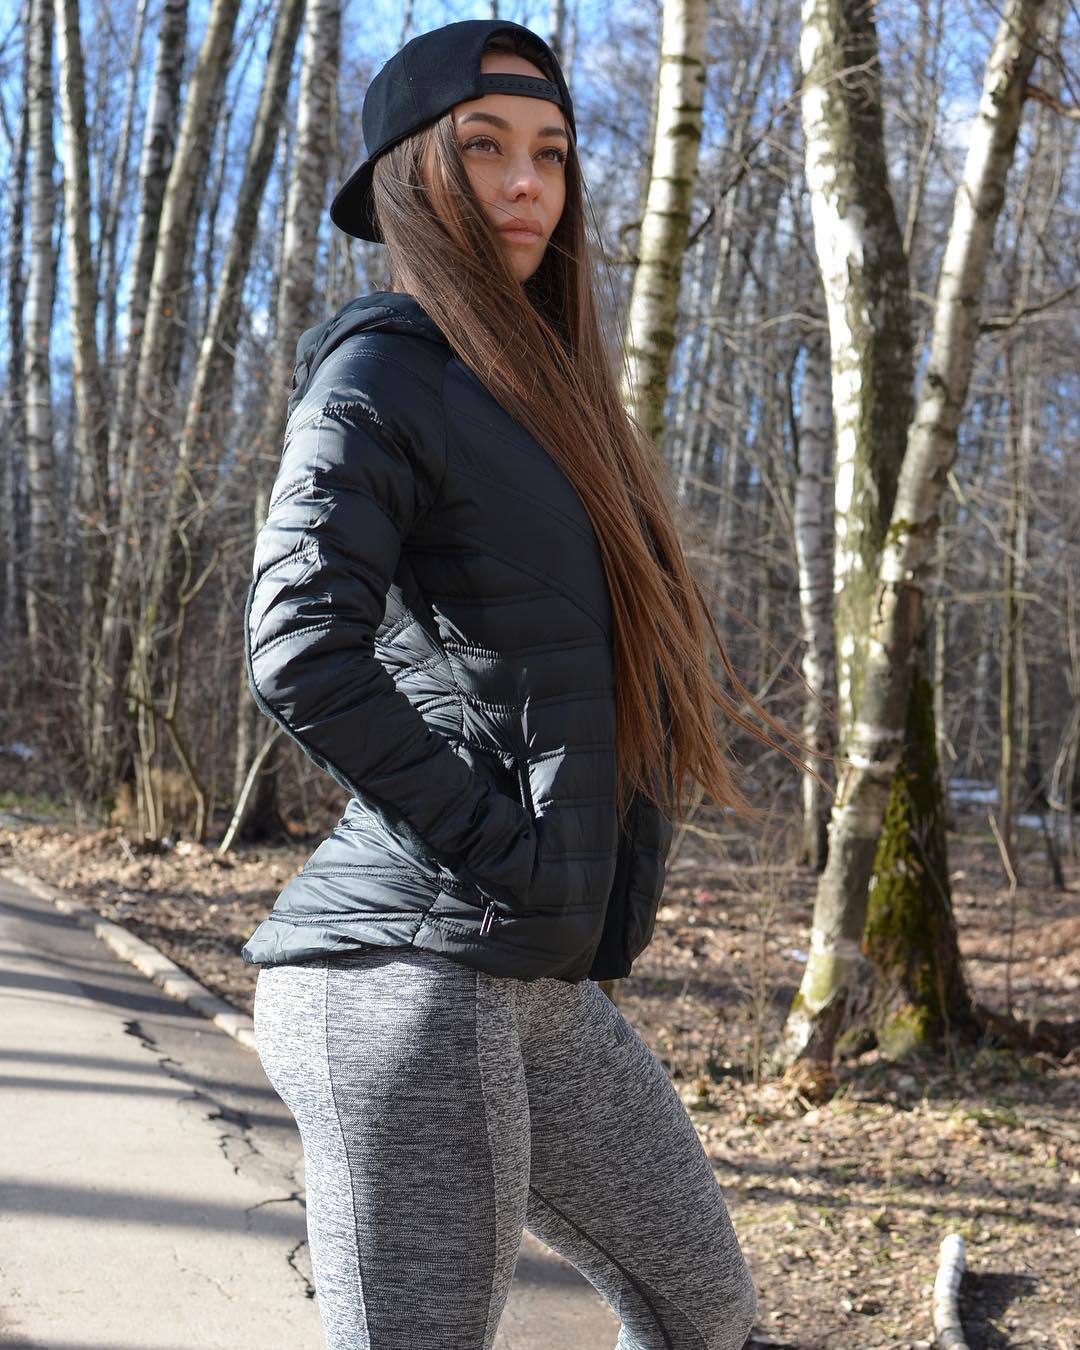 Katrin-Shok-Wallpapers-Insta-Biography-2